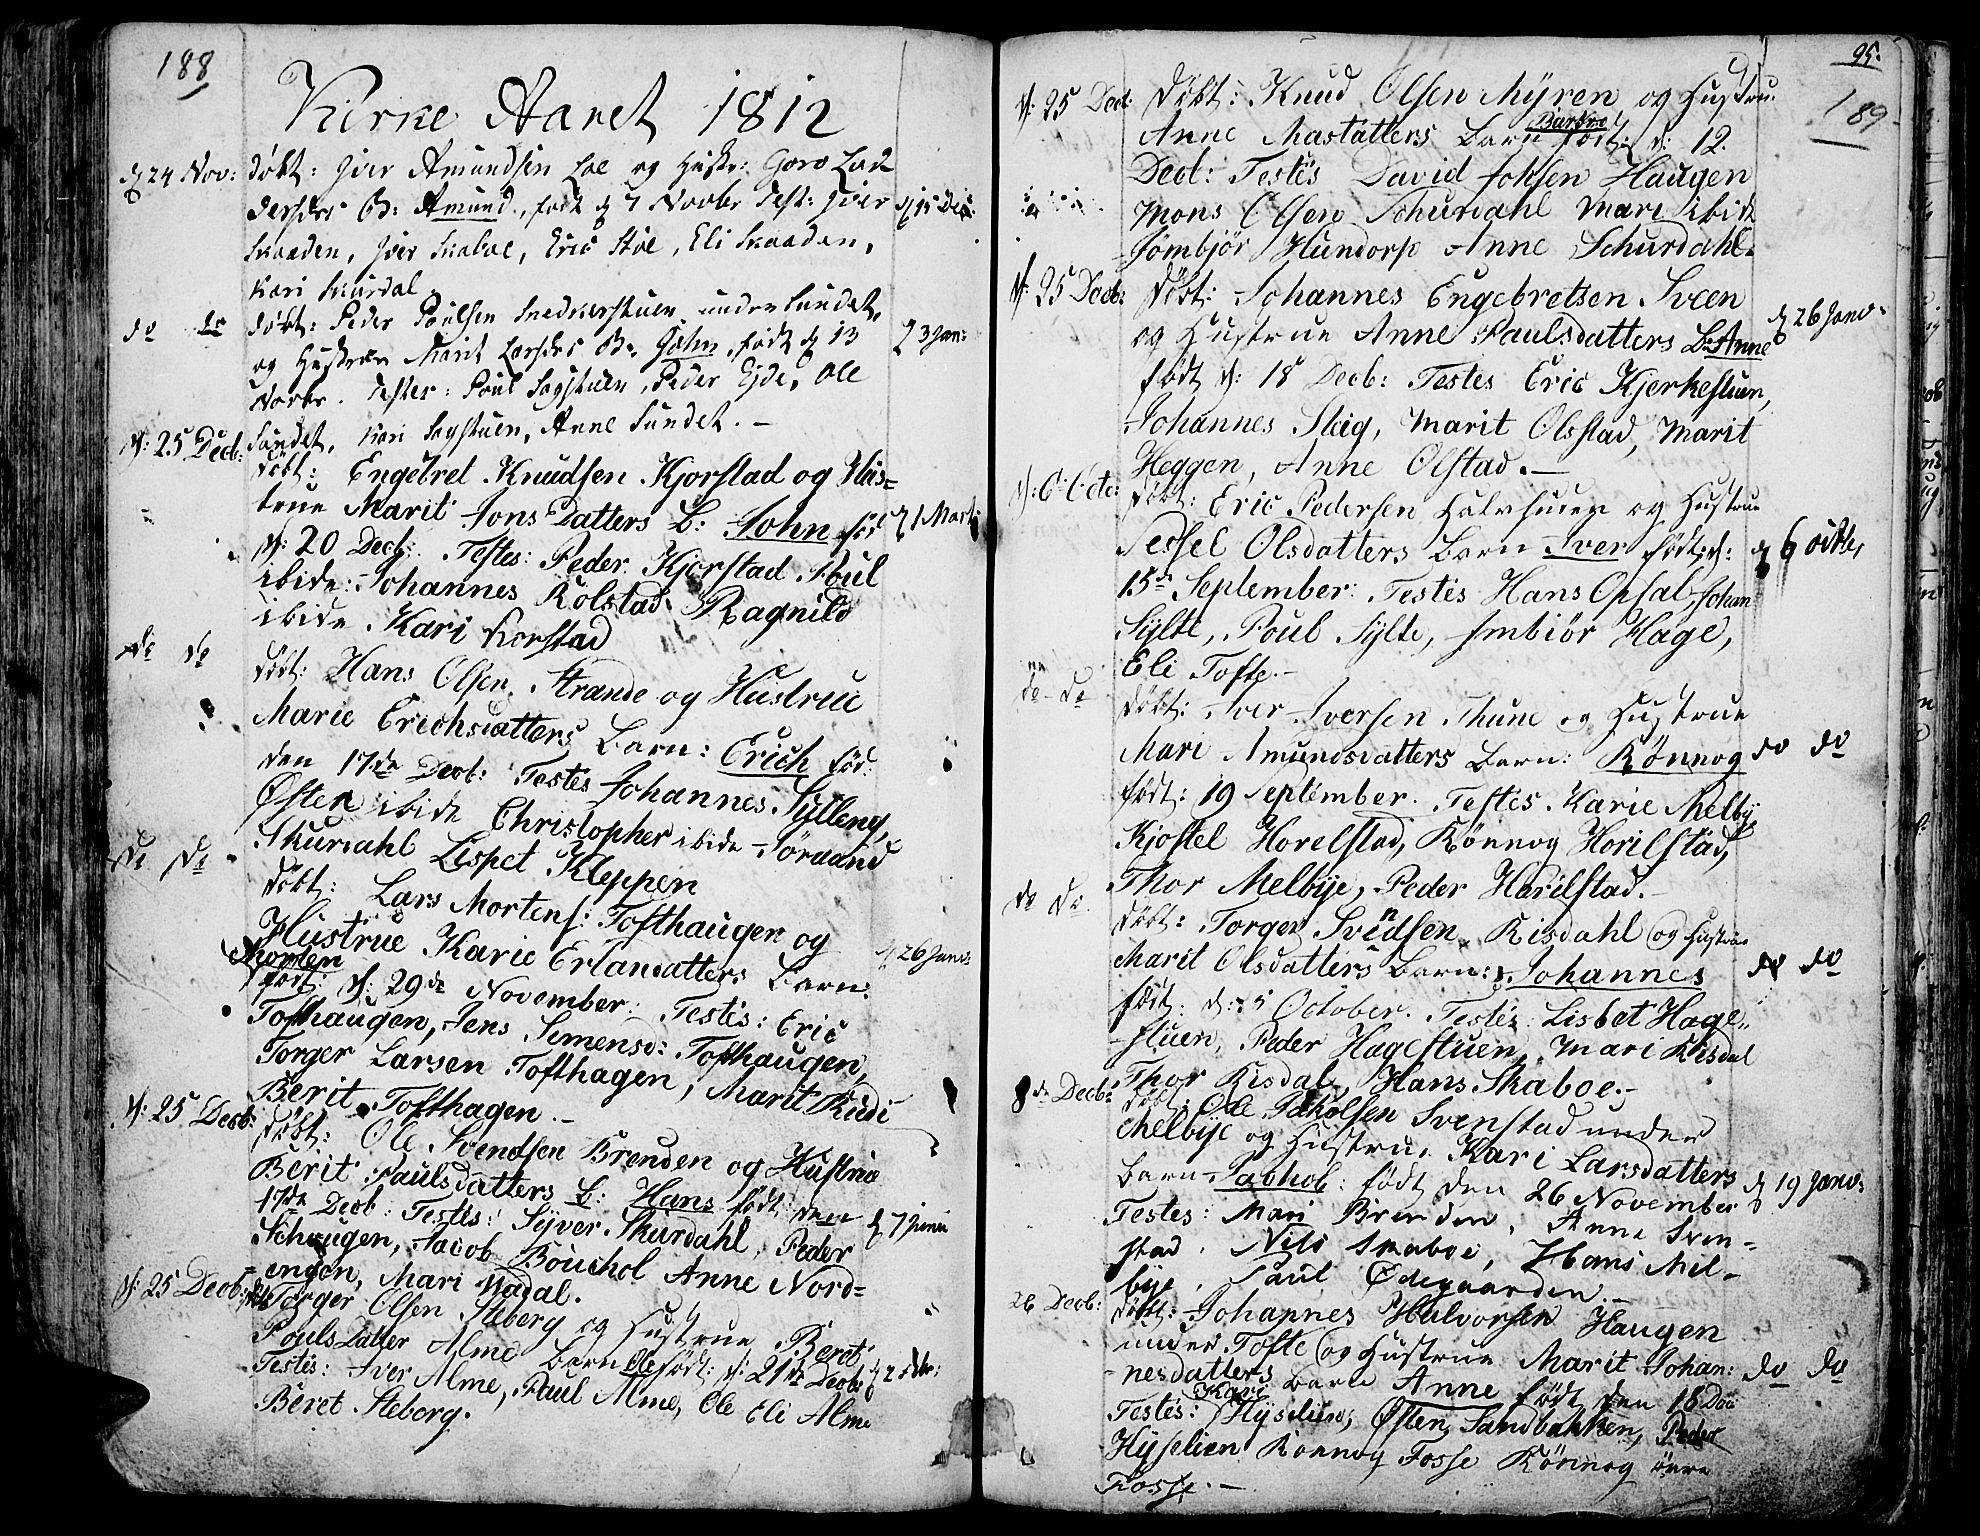 SAH, Fron prestekontor, H/Ha/Haa/L0001: Ministerialbok nr. 1, 1799-1816, s. 188-189